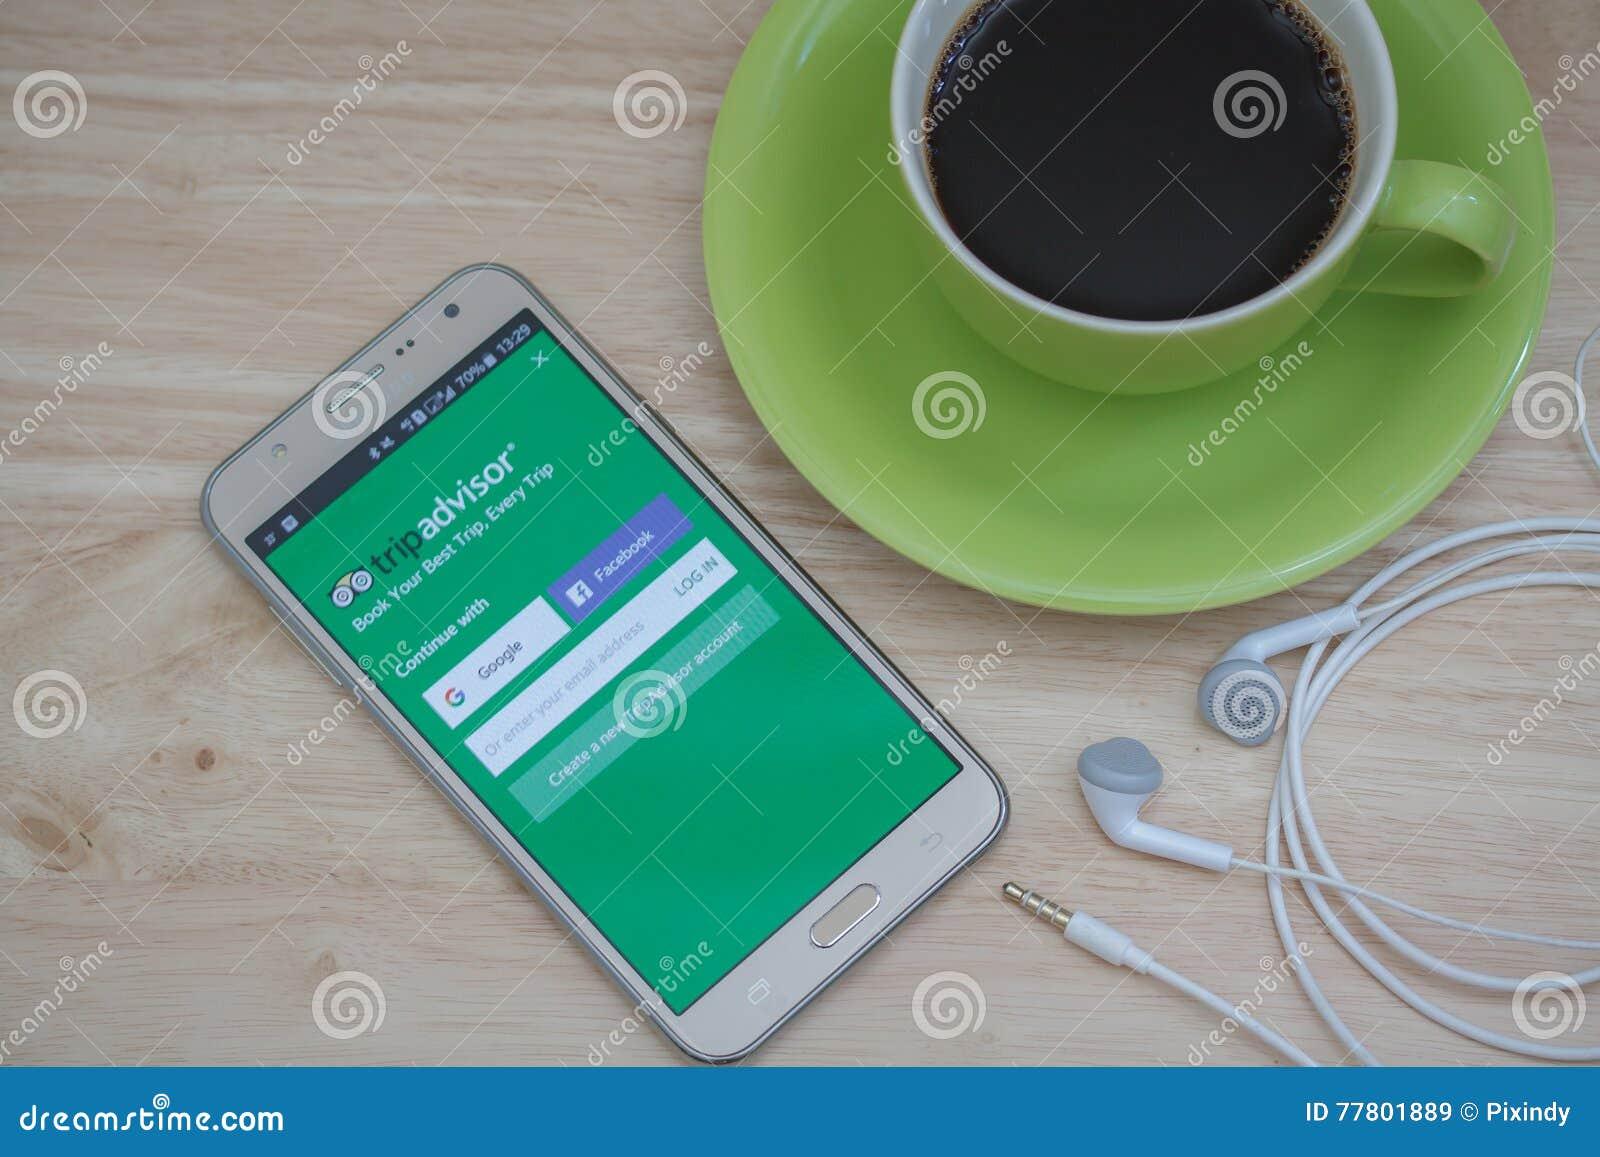 Access abuzarmobi1. Wapka. Mobi. Softjar-mobile java software apps.